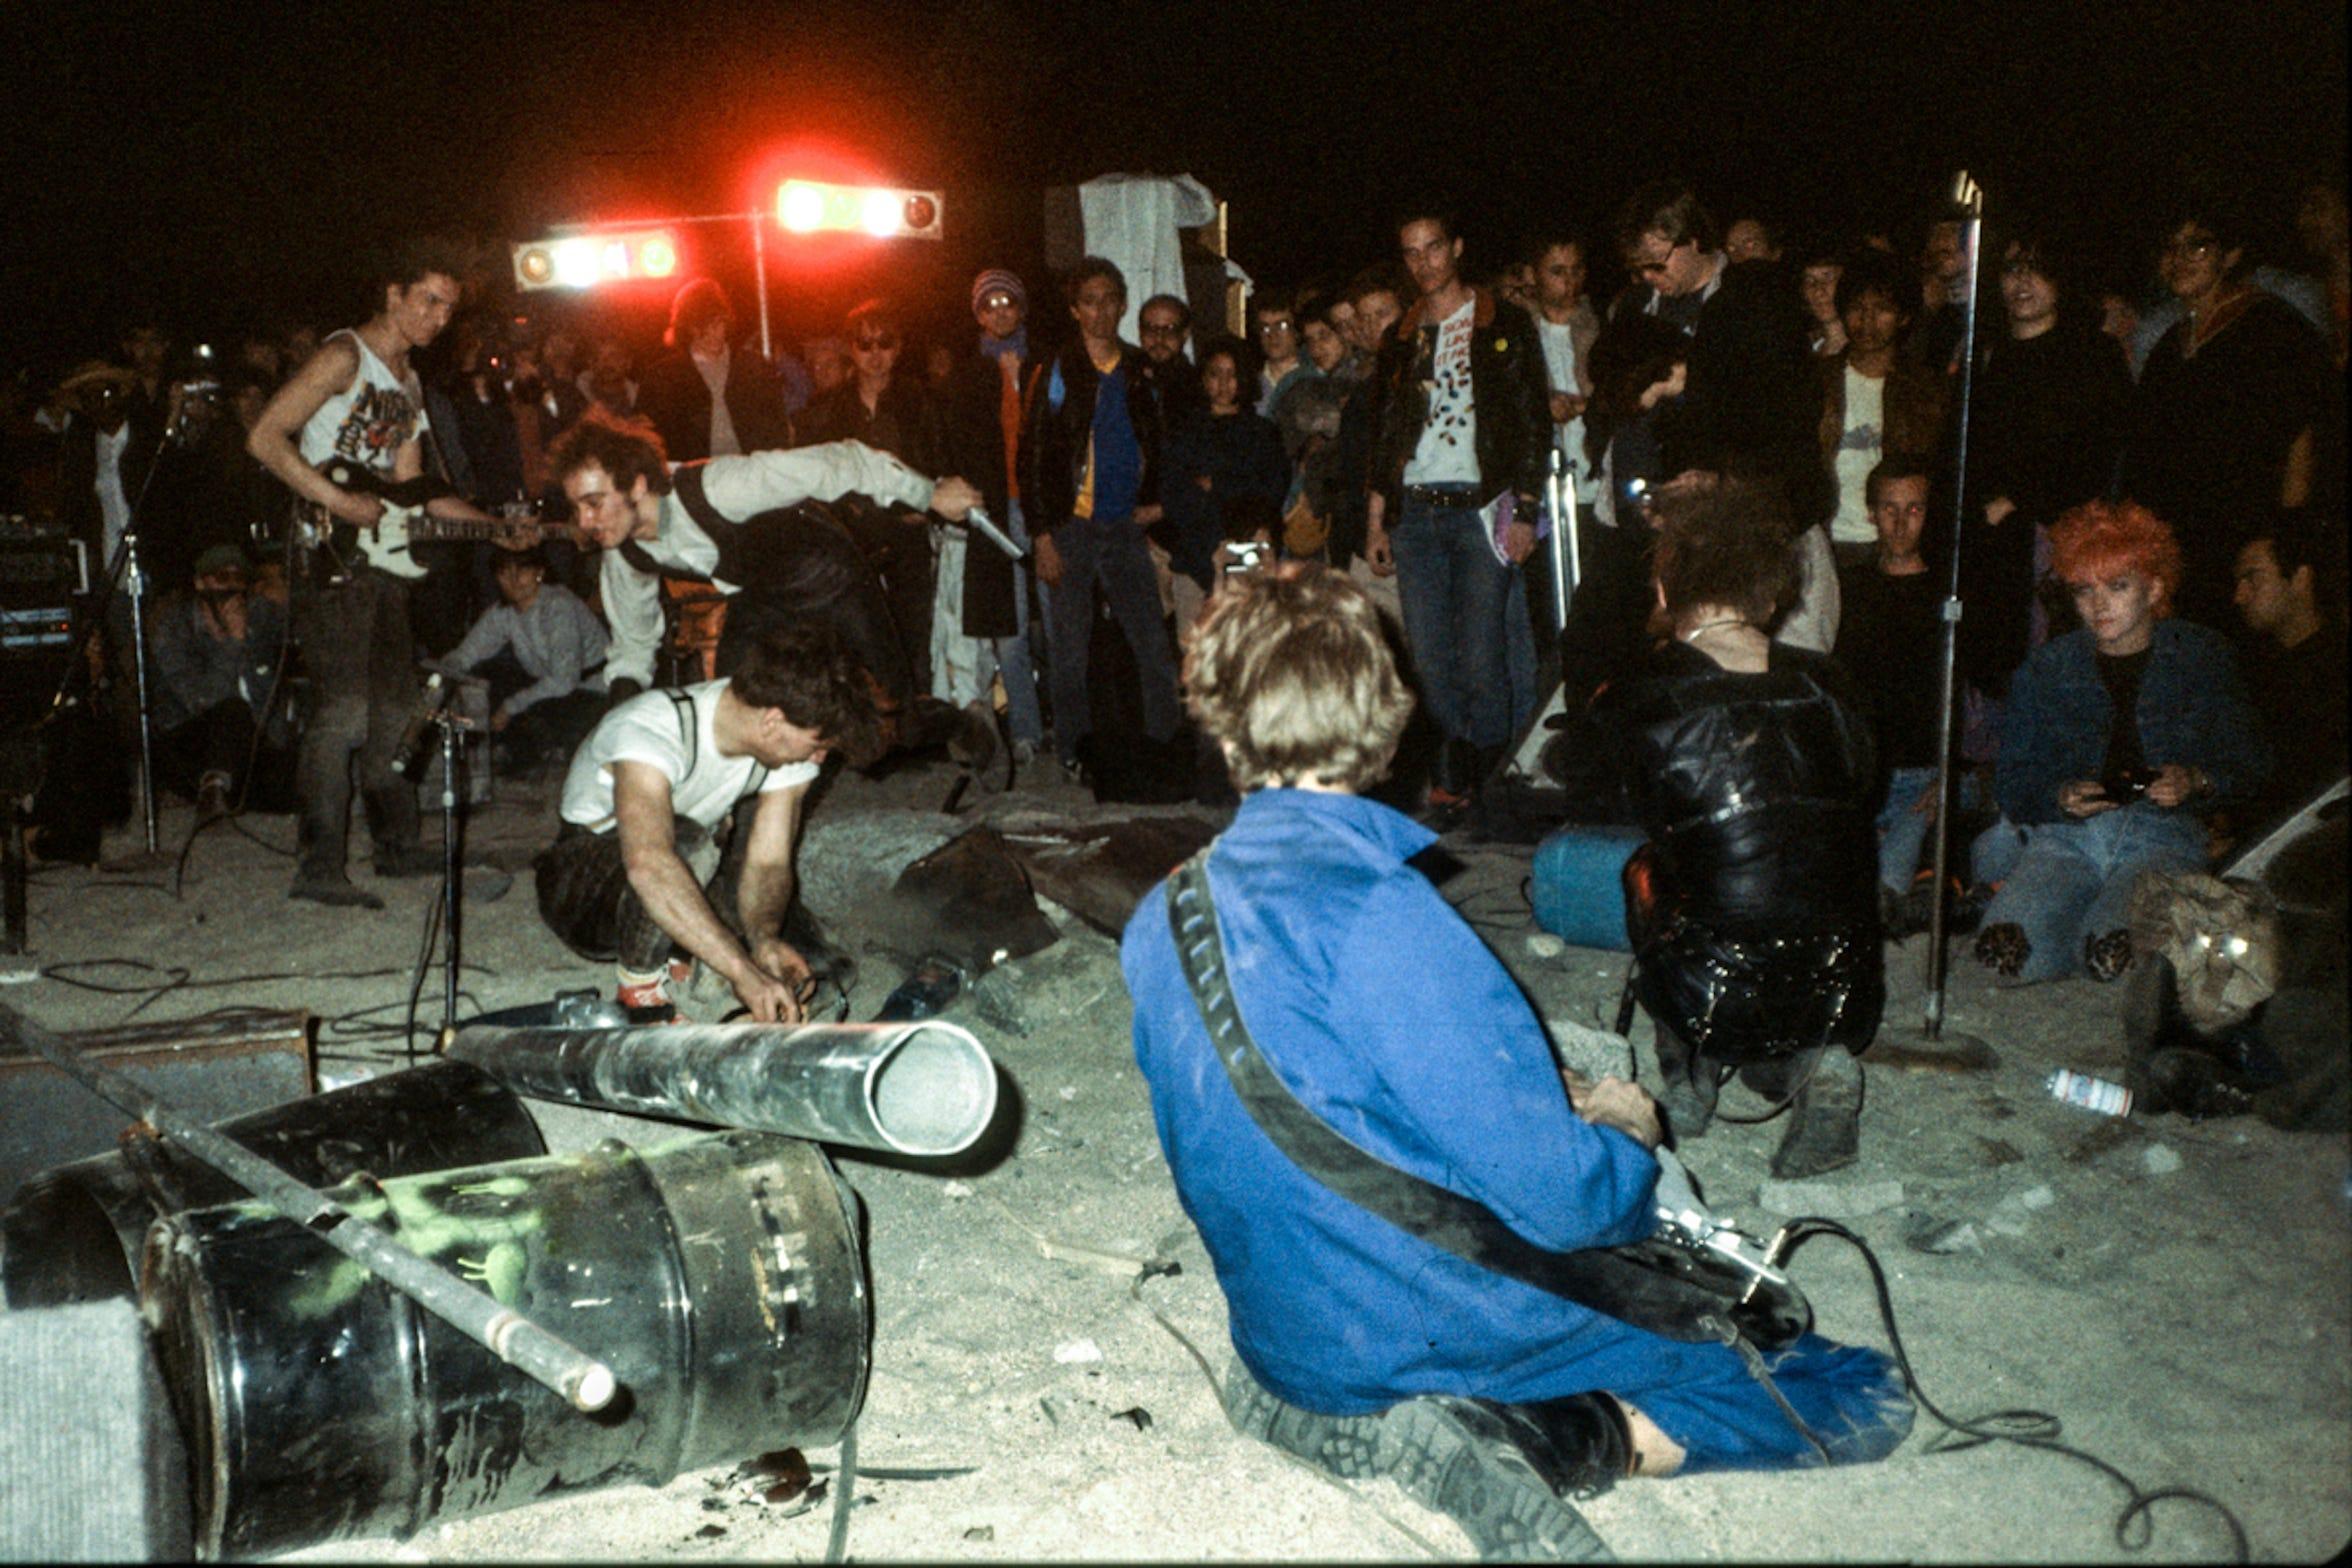 Einstürzende Neubauten's Mojave Auszüg Performance in Box Canyon in Mecca, Calif. March 4, 1984.